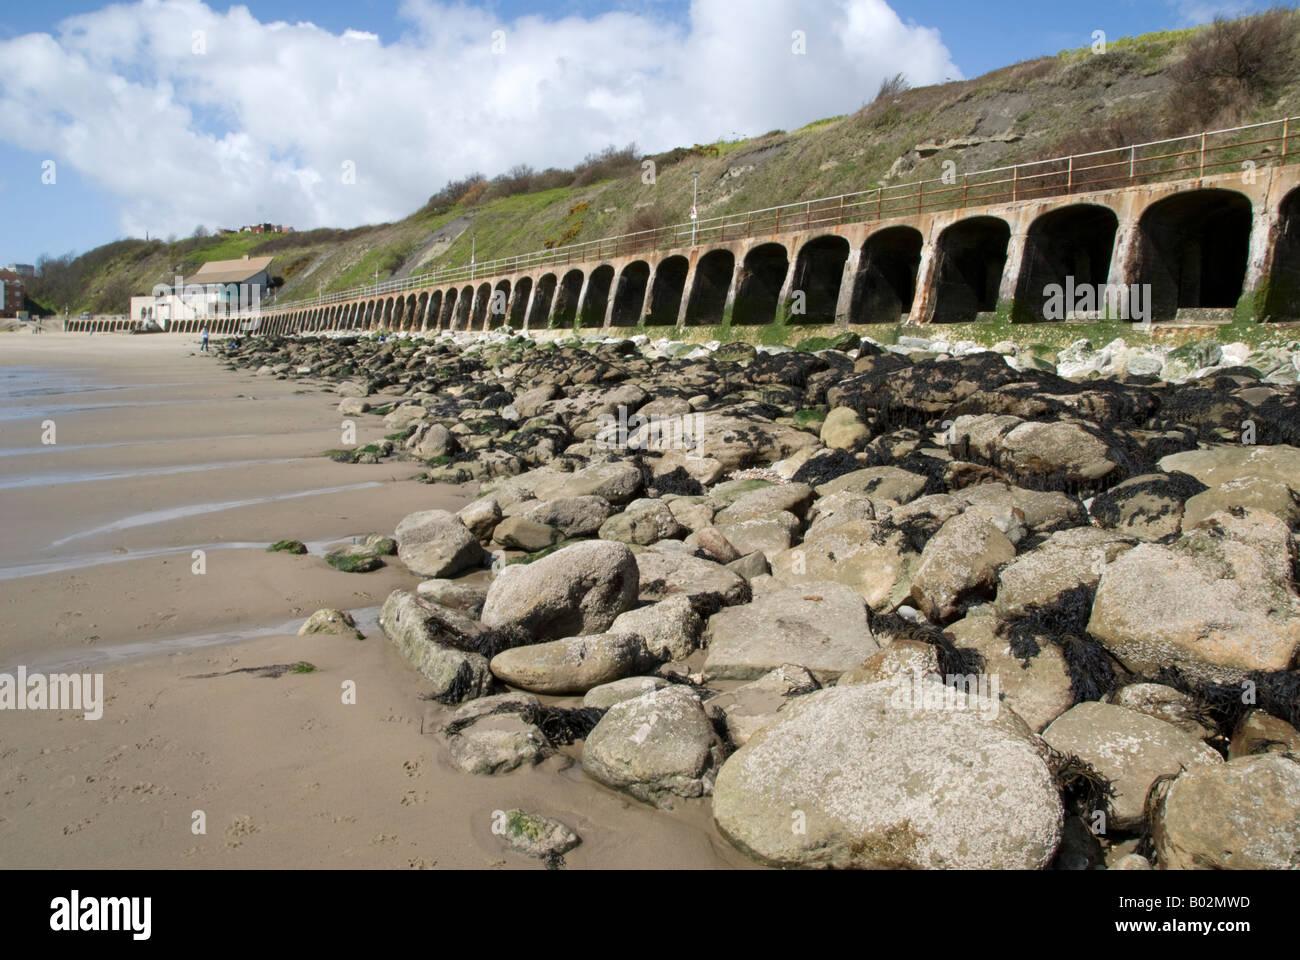 The sea wall and beach at Folkestone, Kent, England. - Stock Image